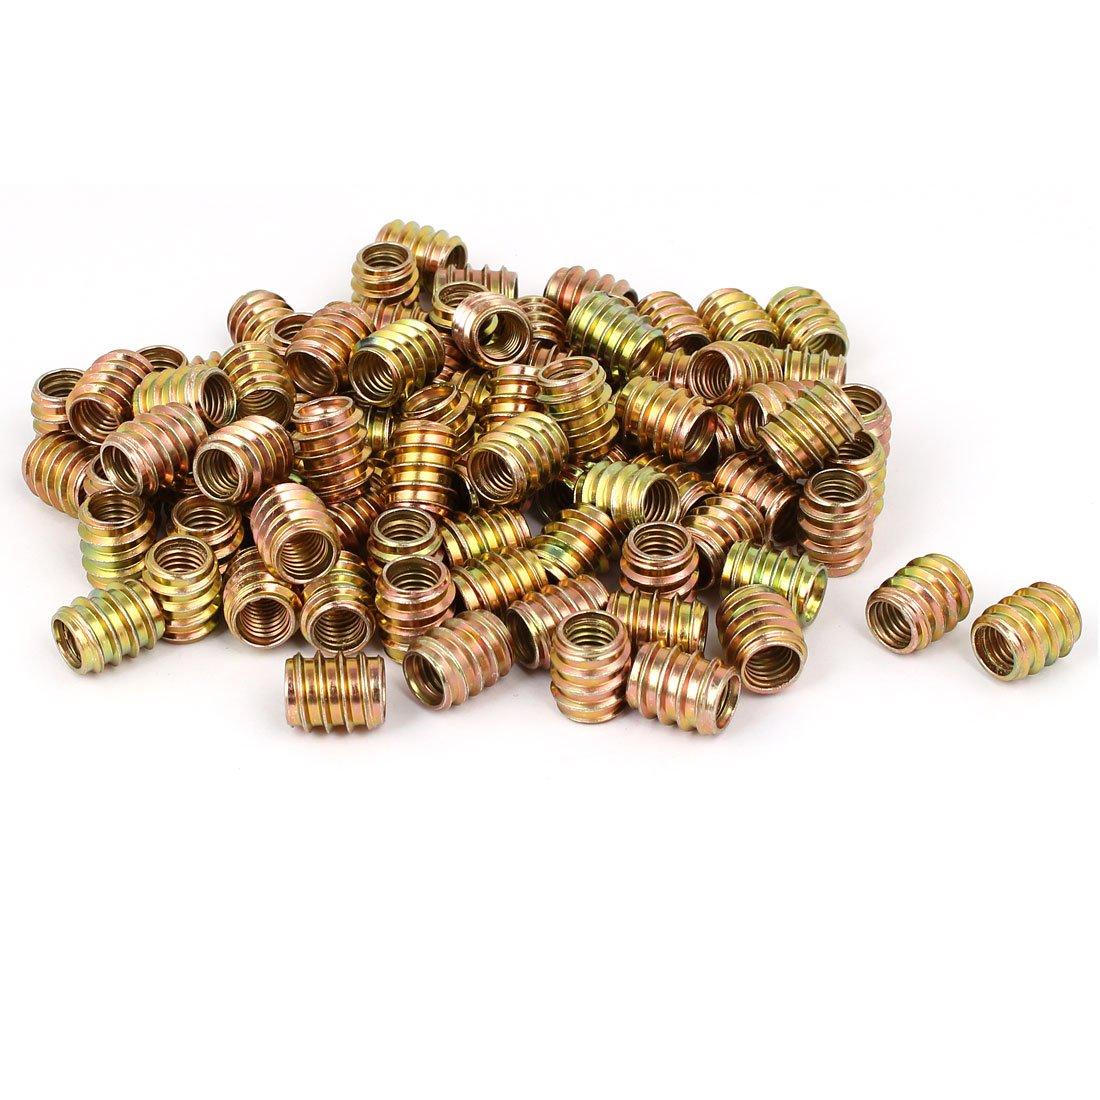 uxcell Wood Furniture Insert Screw E-Nut Bronze Tone M8 x 15mm 100pcs